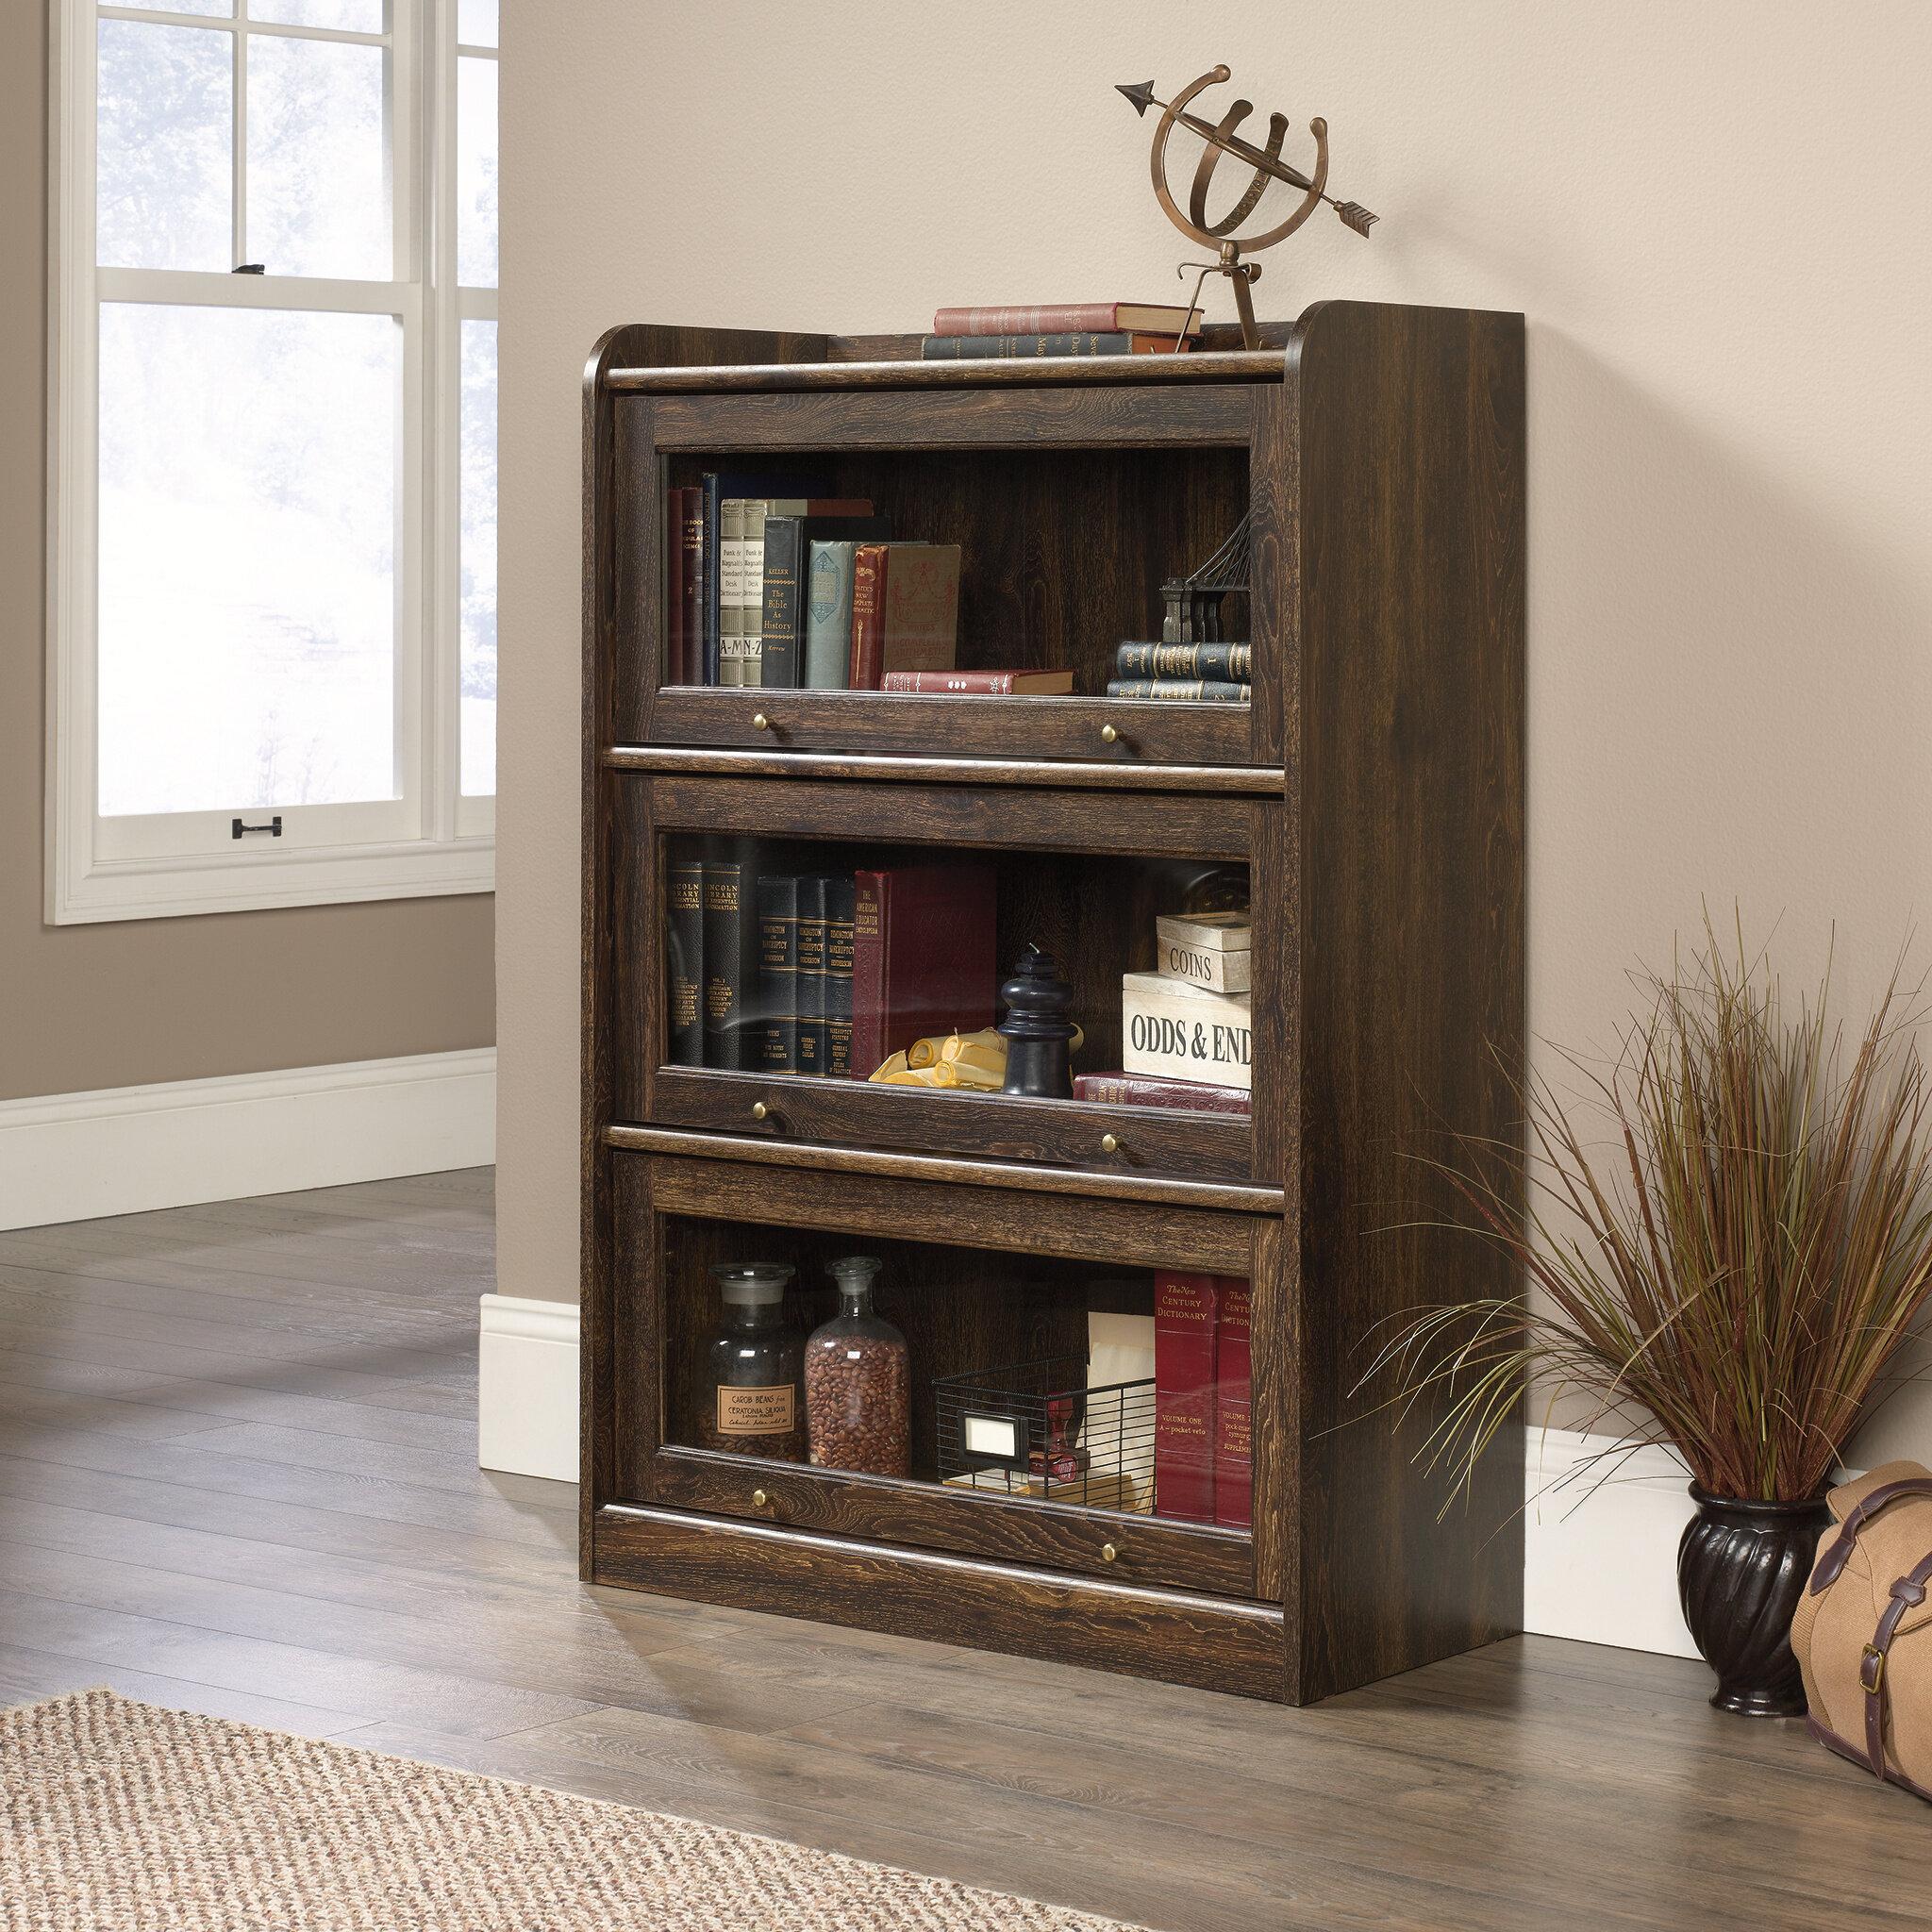 bookcases various c portfolio gothic bookcase style oak enclosed nigel northeast